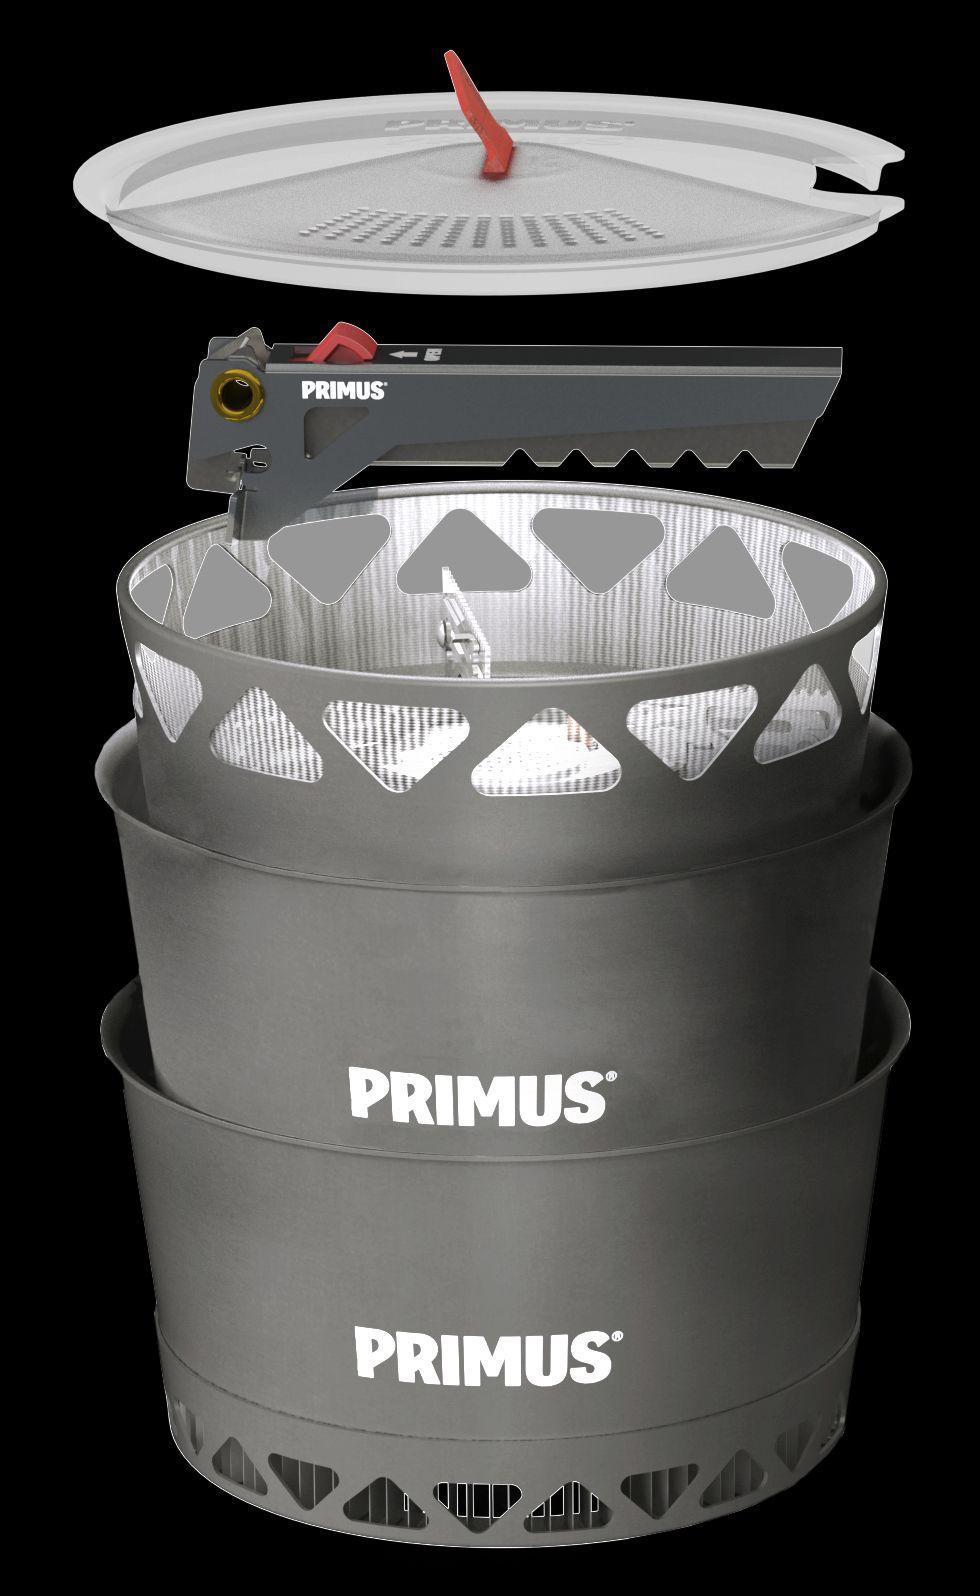 PrimeTech Kocherset – Die ultimativen Trekking-Kochersets